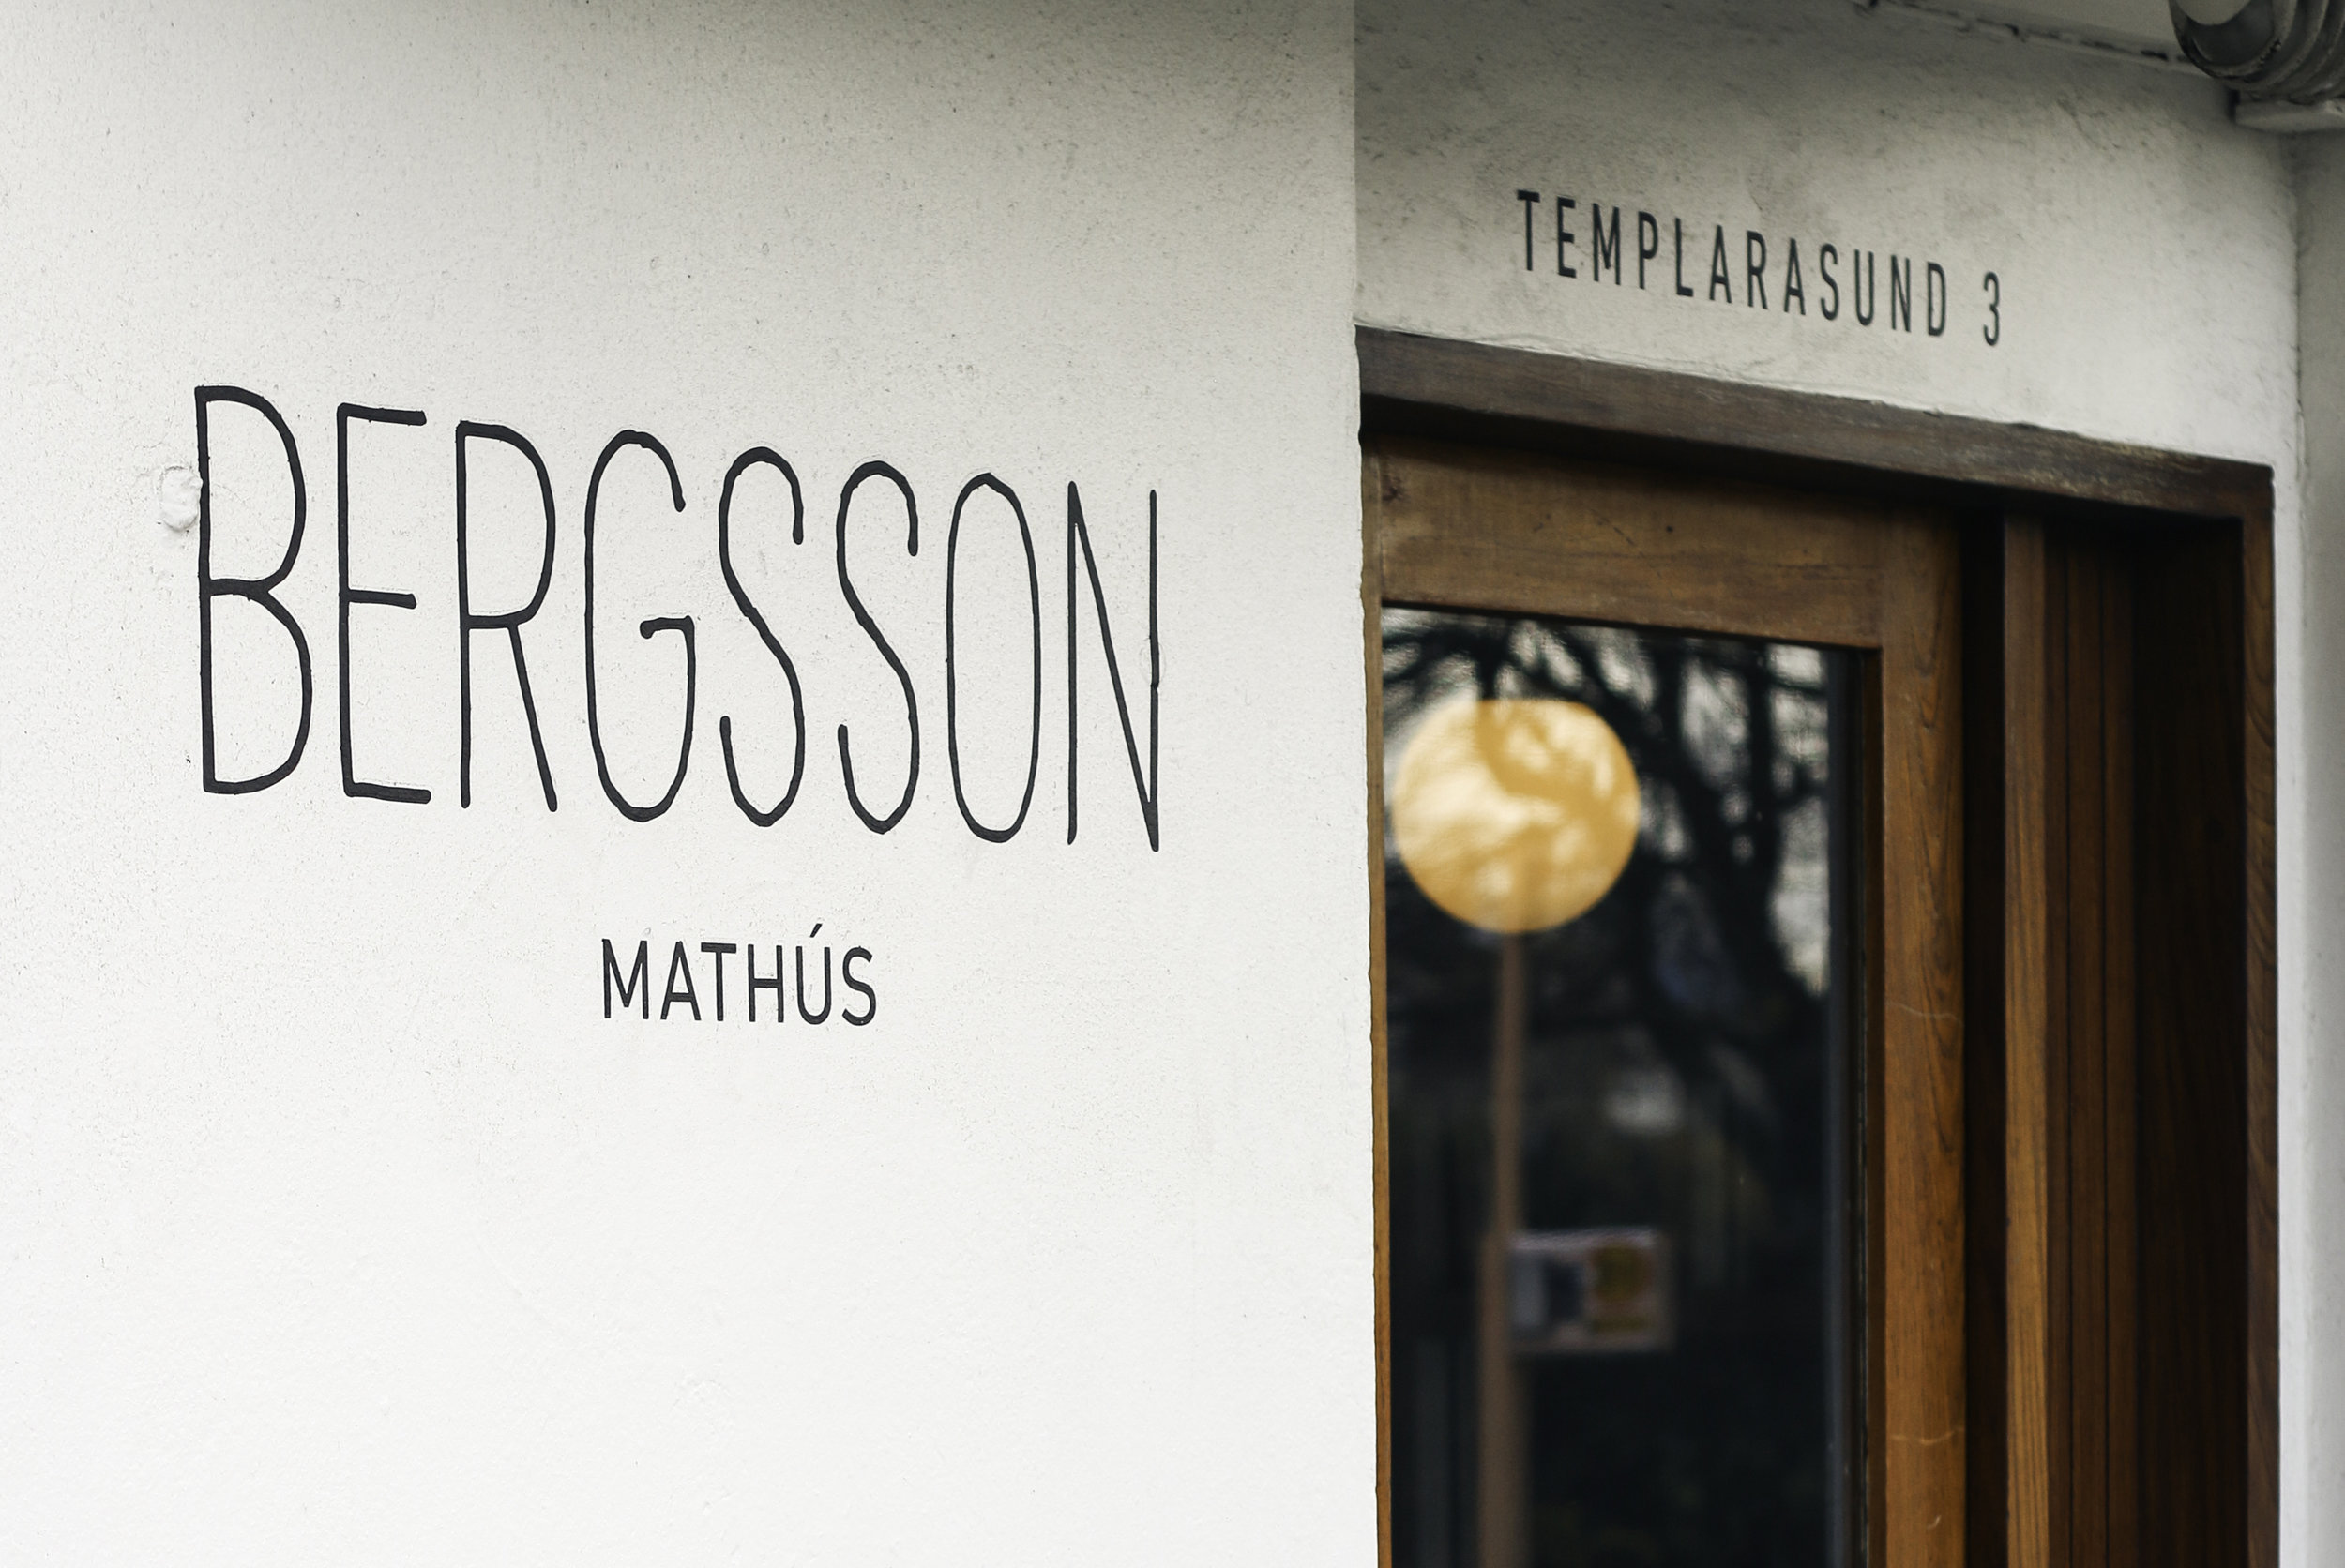 Bergsonmathus.jpg